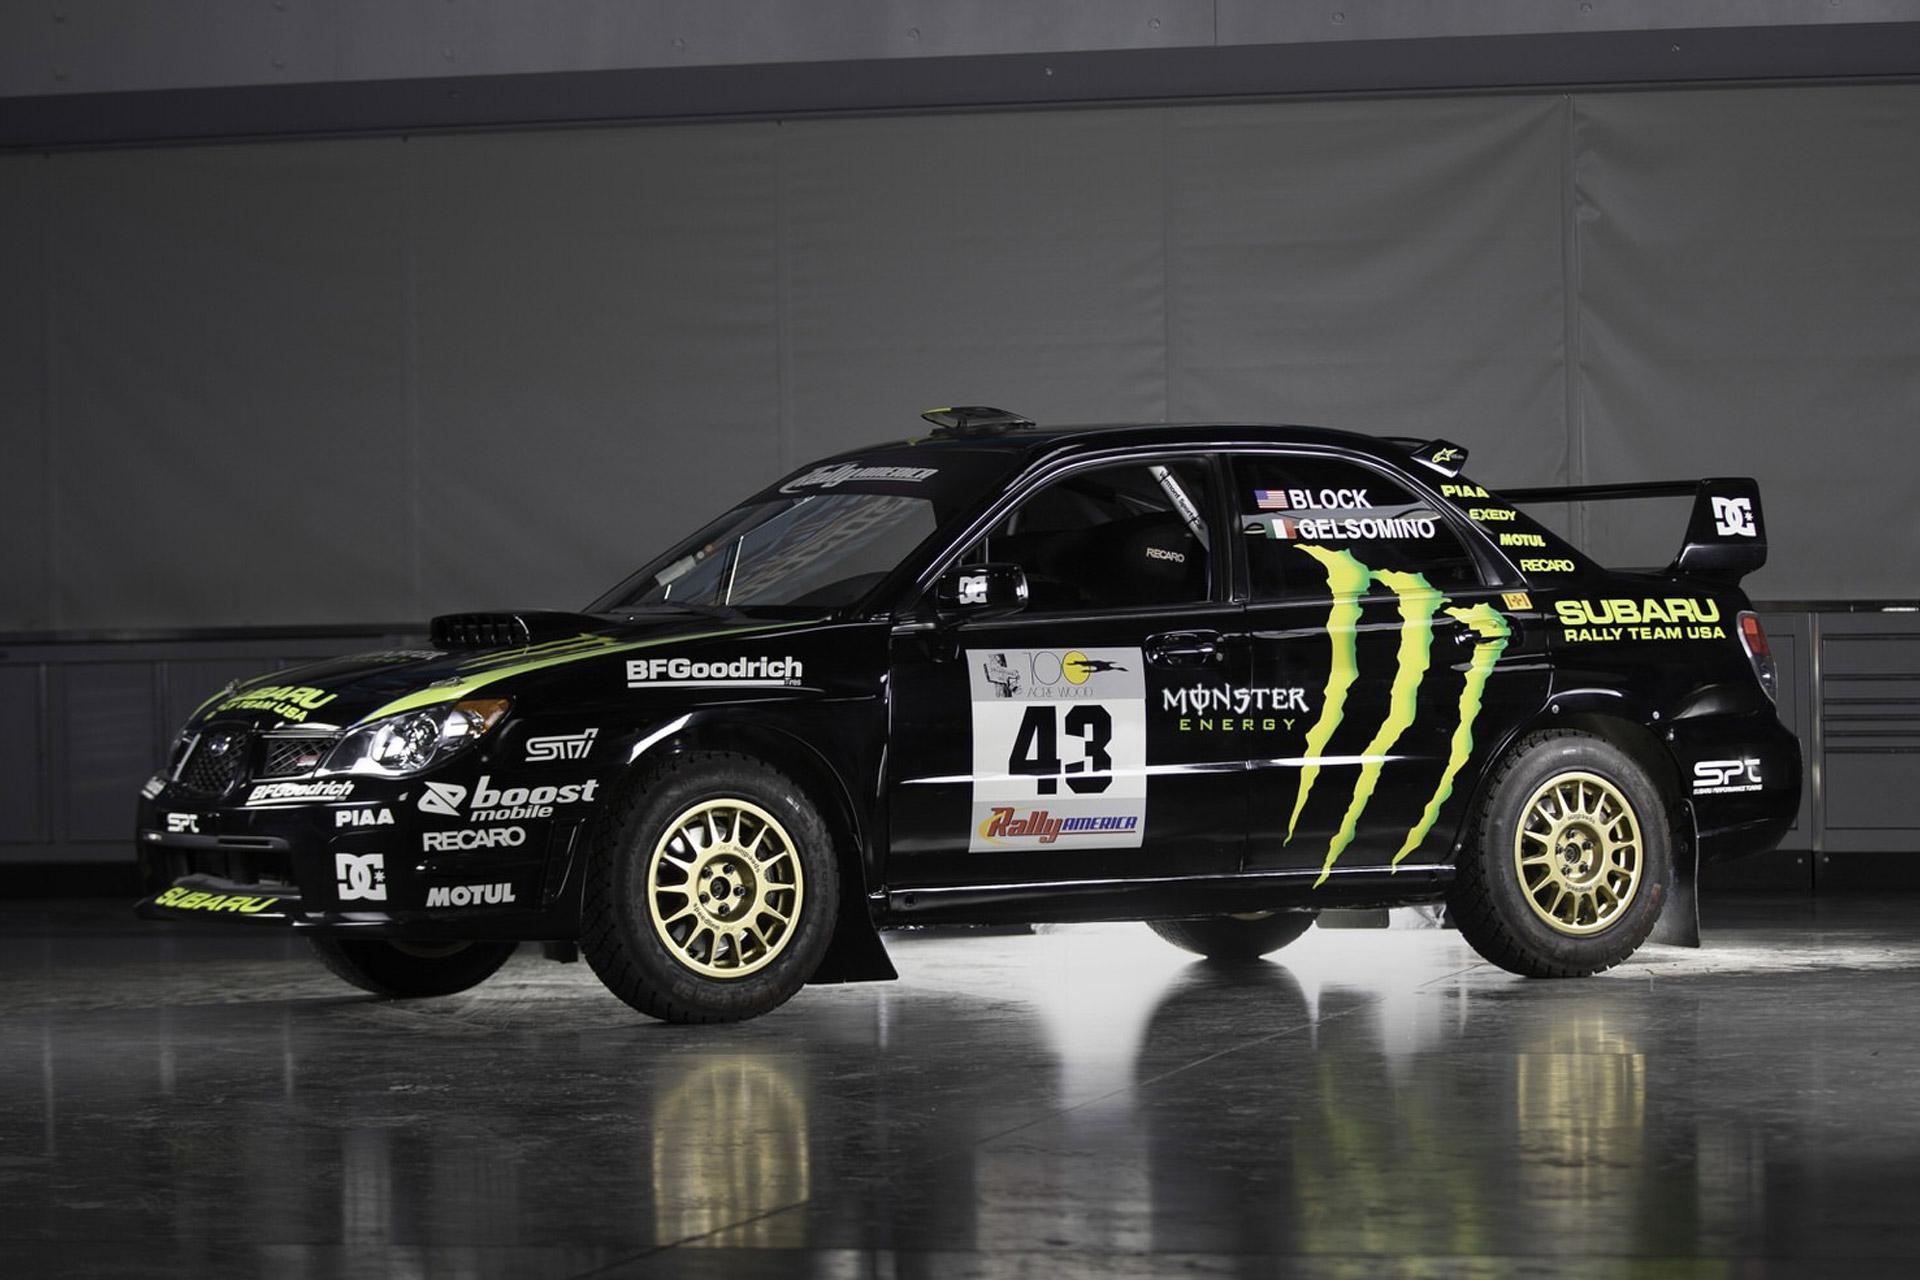 Ken Block's 2002 Subaru WRX STI Rally Car